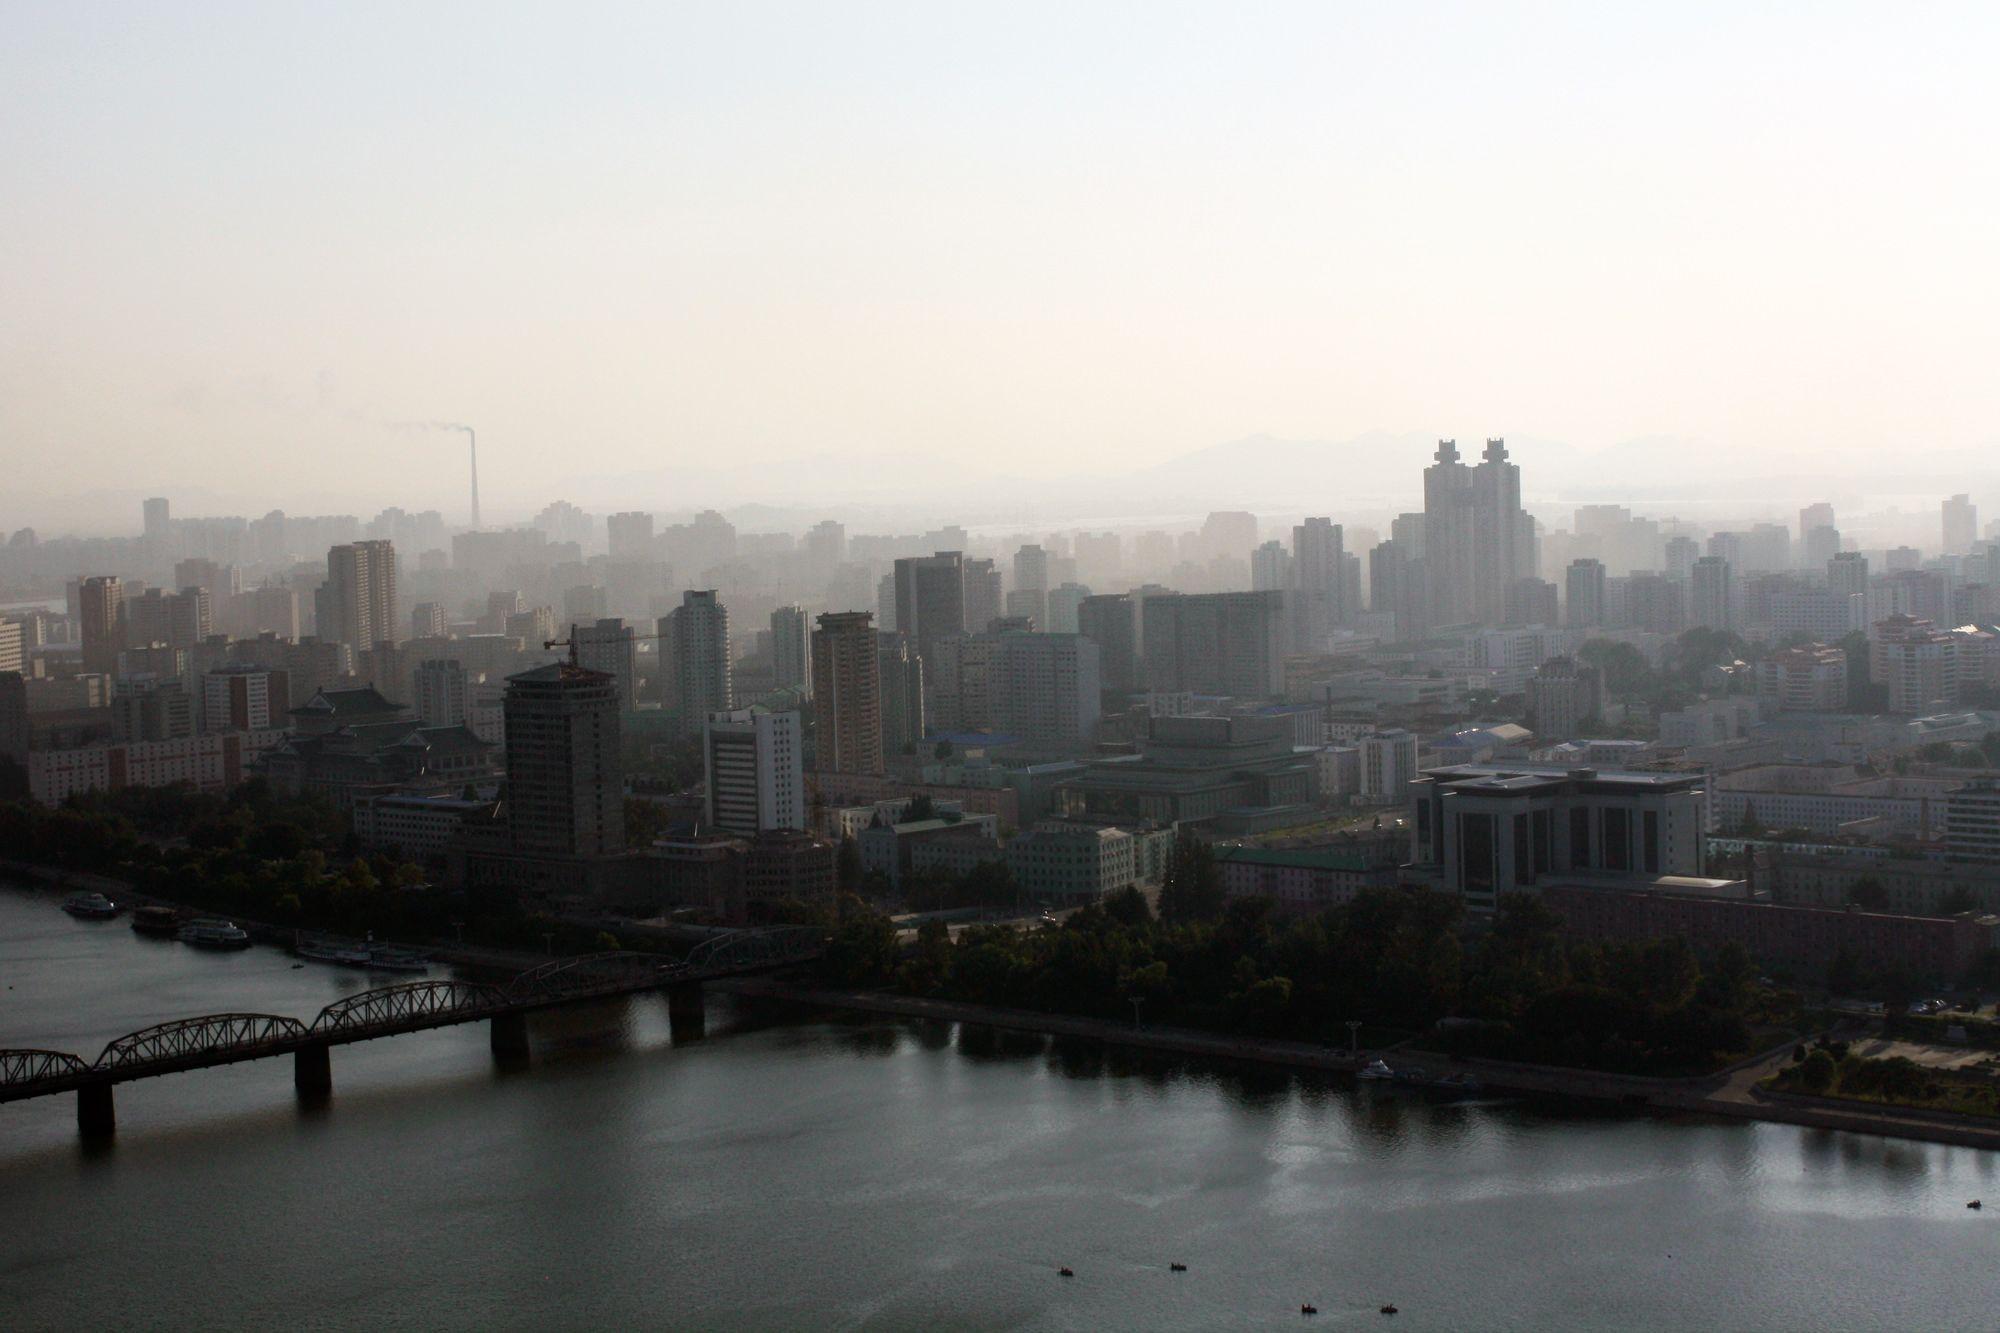 North Korea 2013 - A travel journal